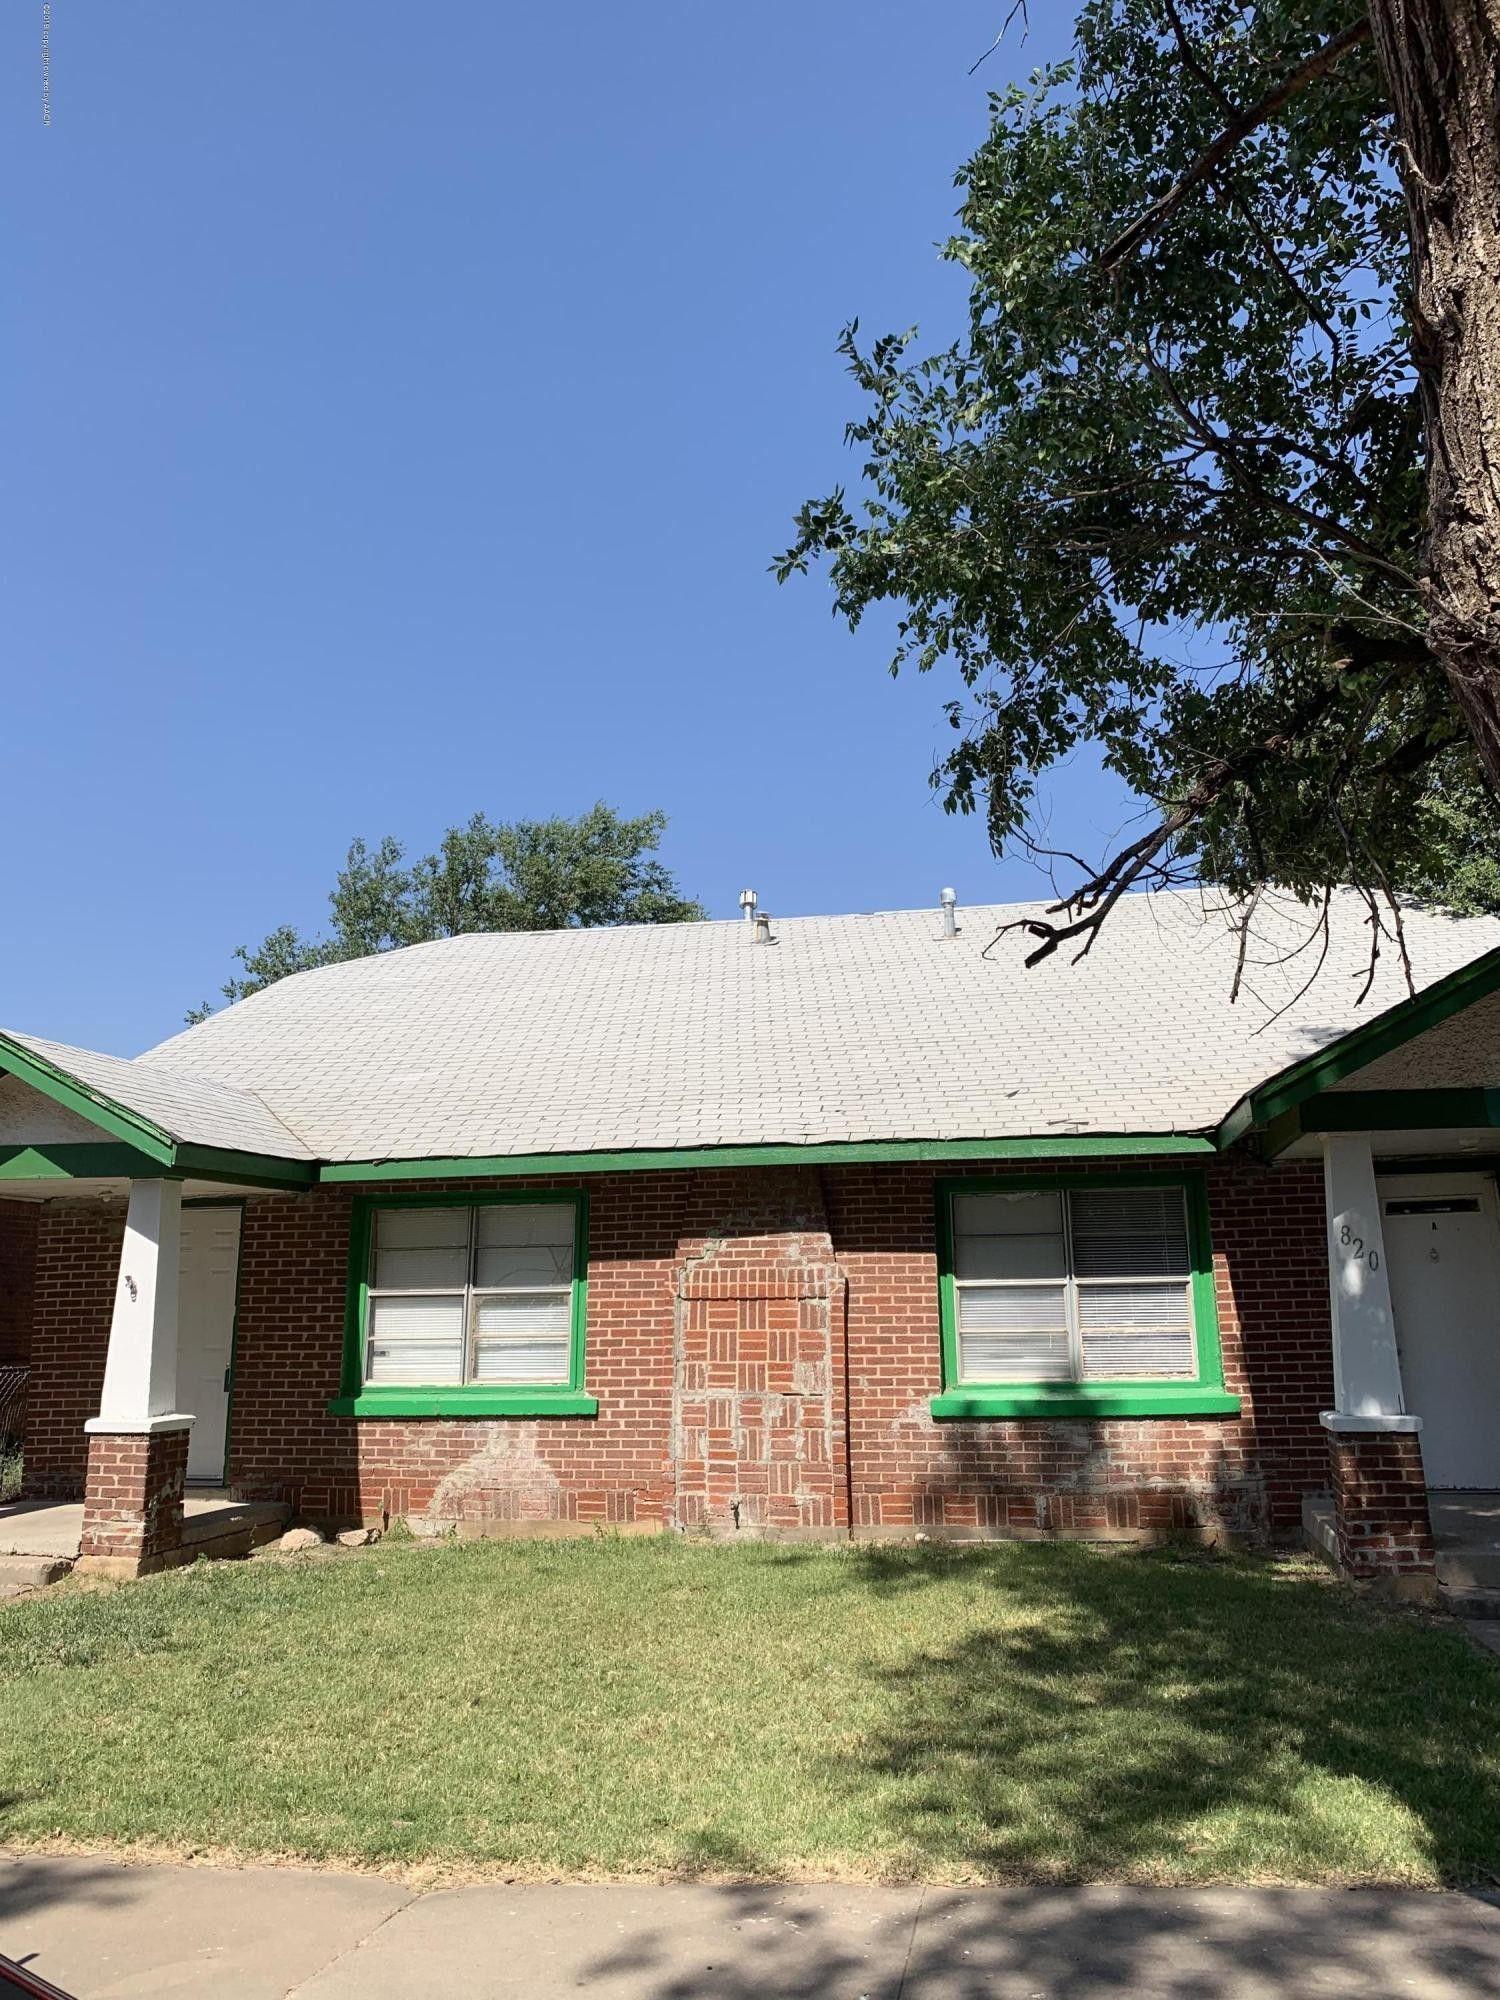 820 S Alabama St Amarillo Tx 79106 House Styles Outdoor Decor Backyard